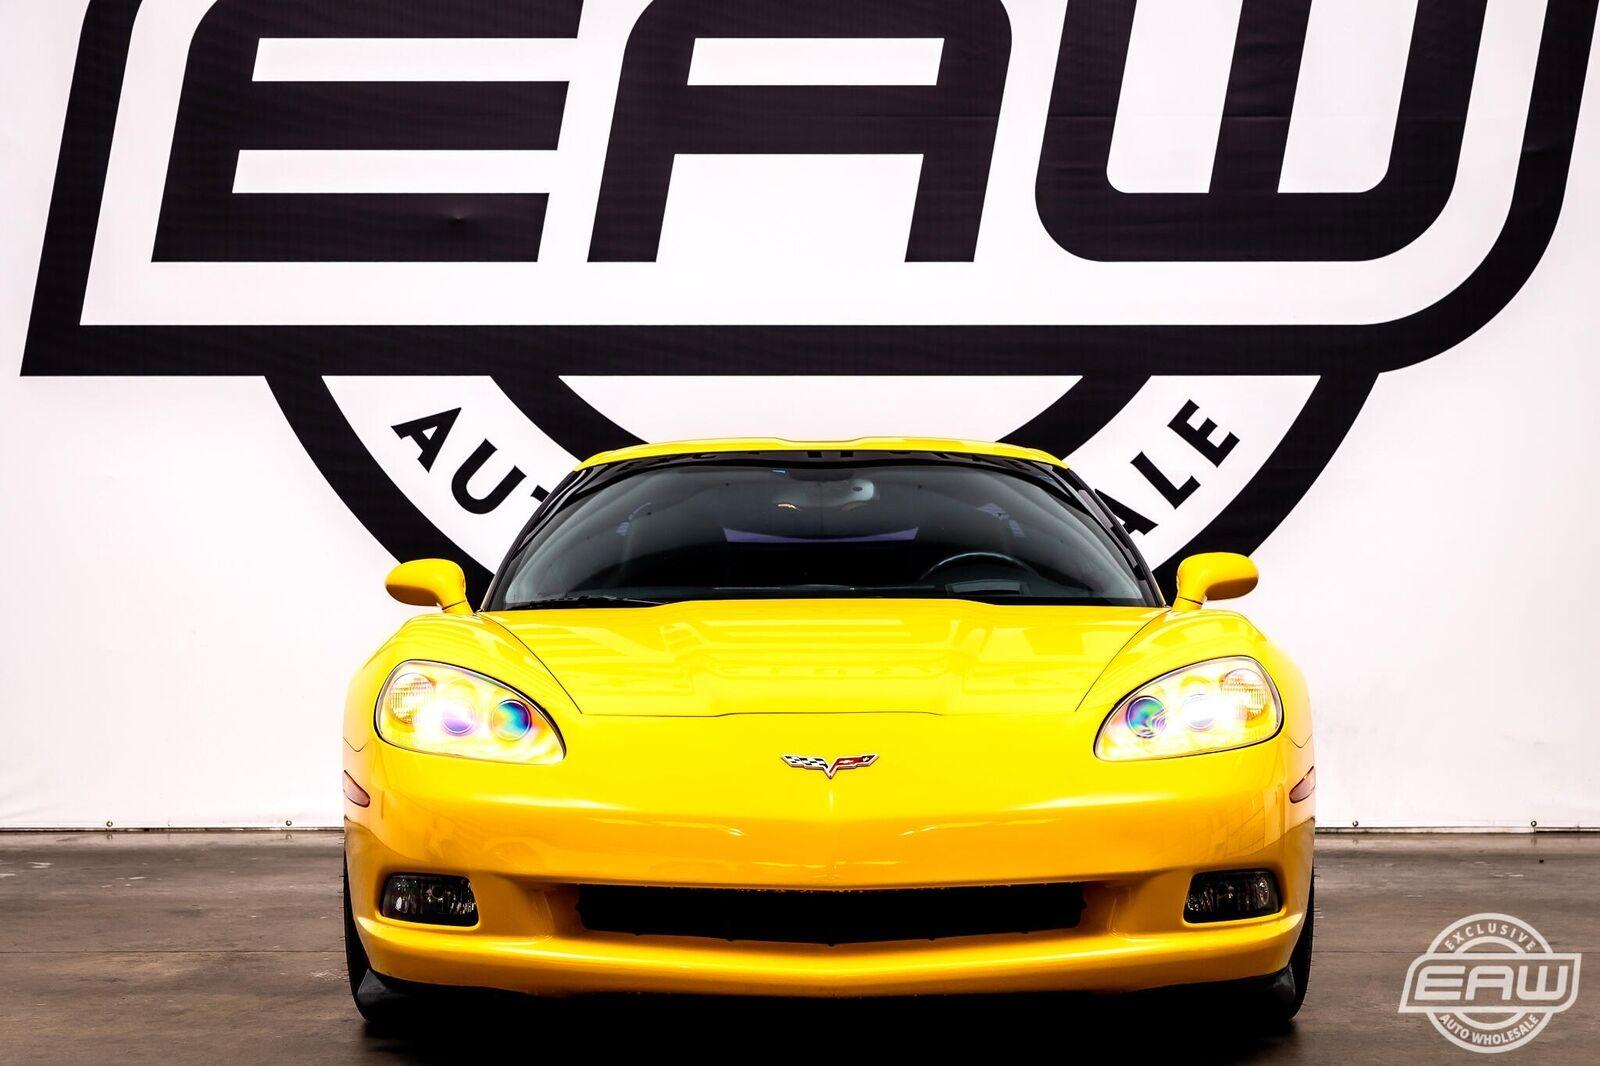 2005 Yellow Chevrolet Corvette Coupe  | C6 Corvette Photo 6